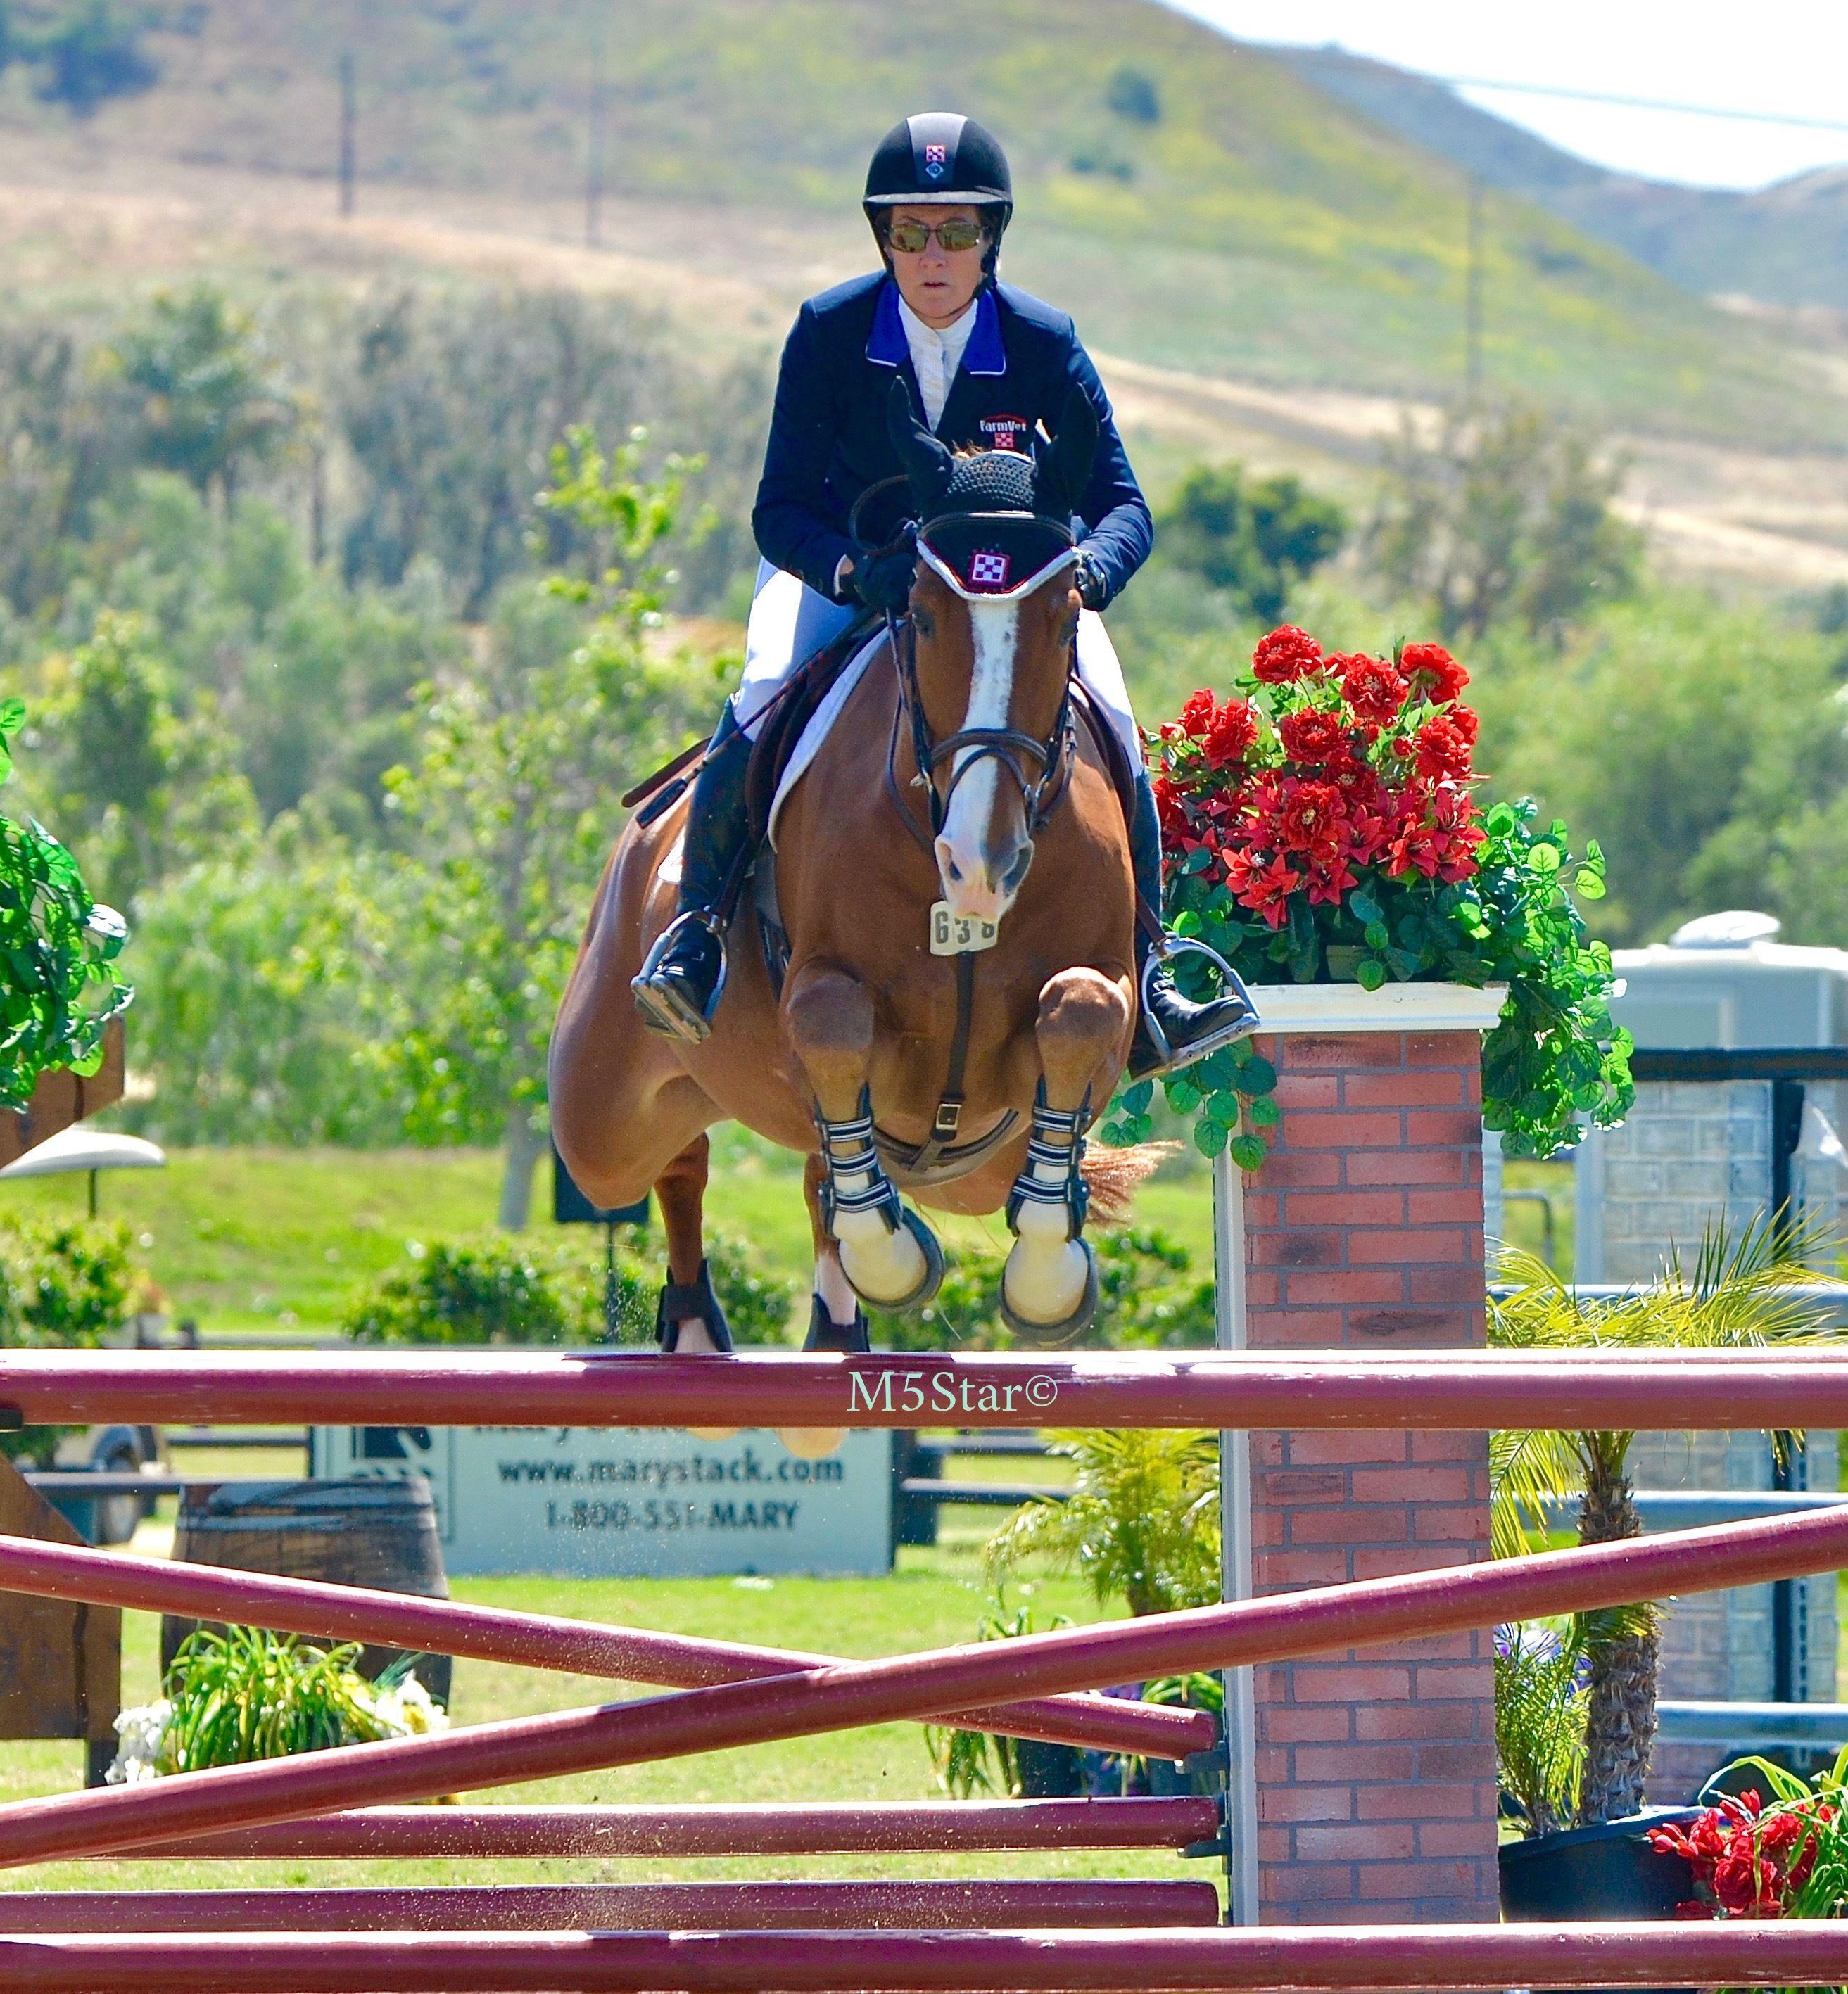 Malibu 5star Naturals Ambassador Rider Mandy Porter Close Up Flying High At The Oaks 2016 Photo By Wendy Gleason Malibu5starnaturals Com Cheval